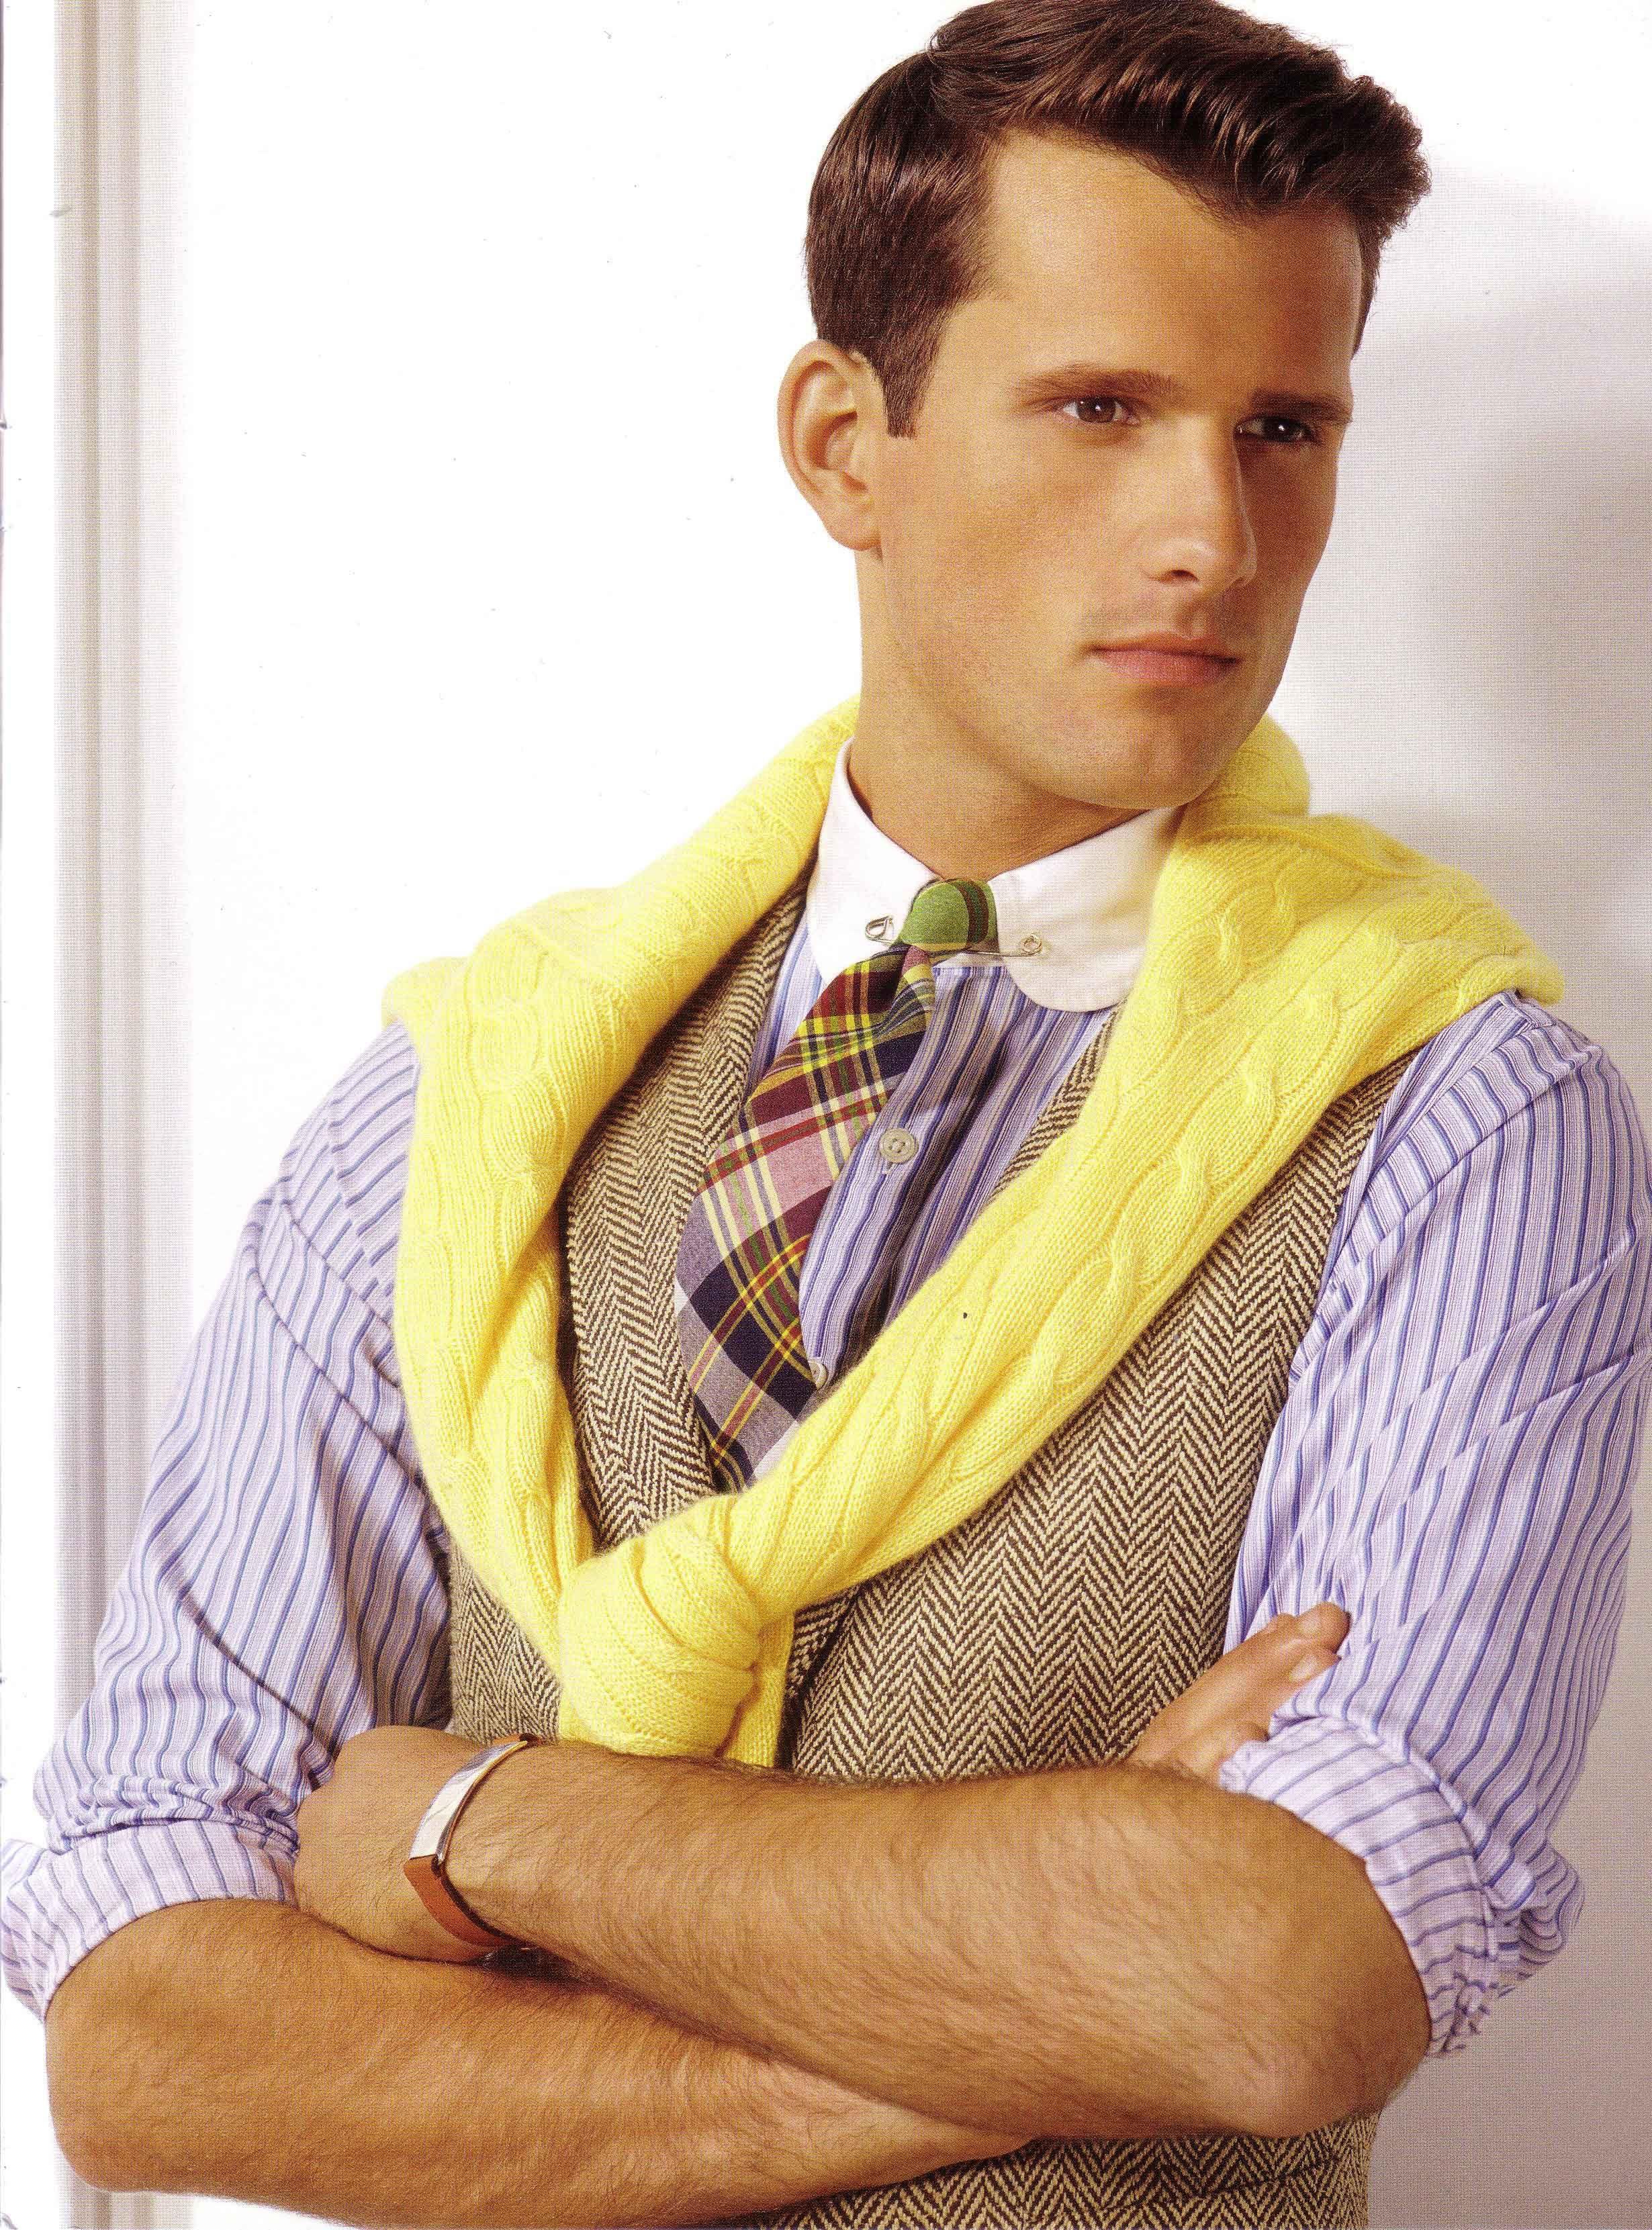 Ralph Lauren Spring Essentials Madras Tie Poplin Cotton Shirt Yellow Cotton Cable Knit Sweater Preppy Mens Fashion Mens Fashion Classic Ivy League Style